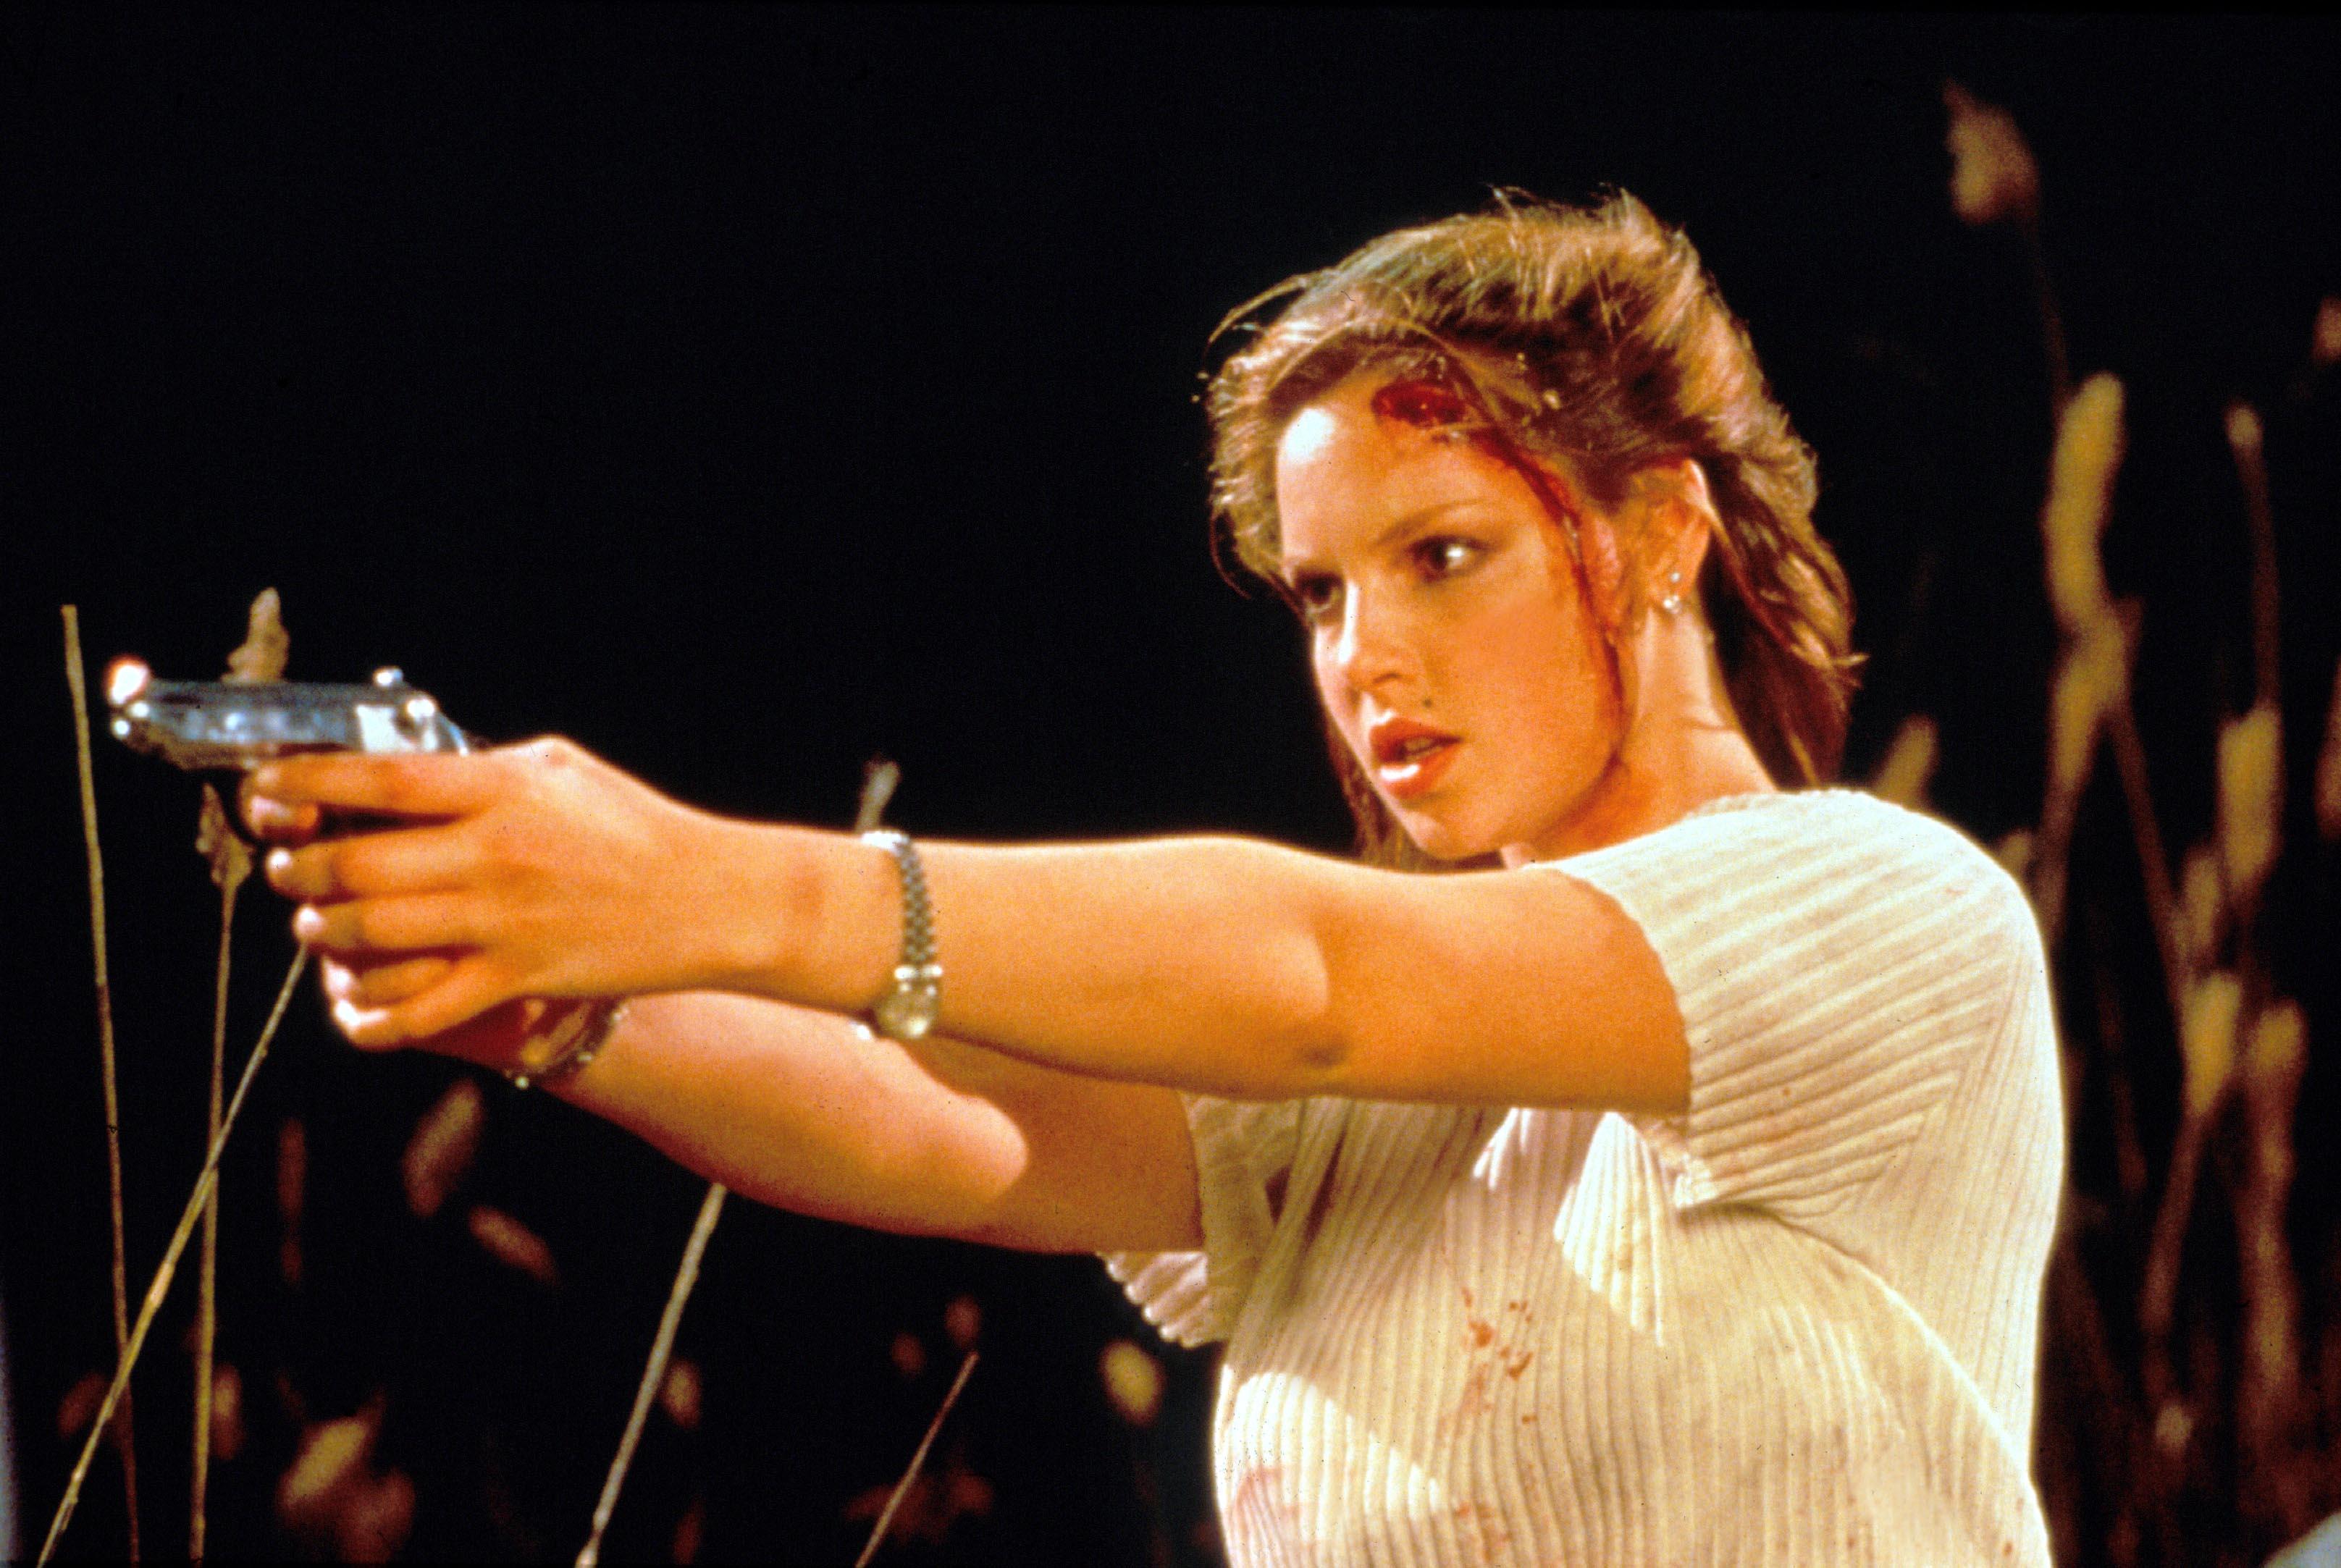 Katherine Heigl, Bride of Chucky